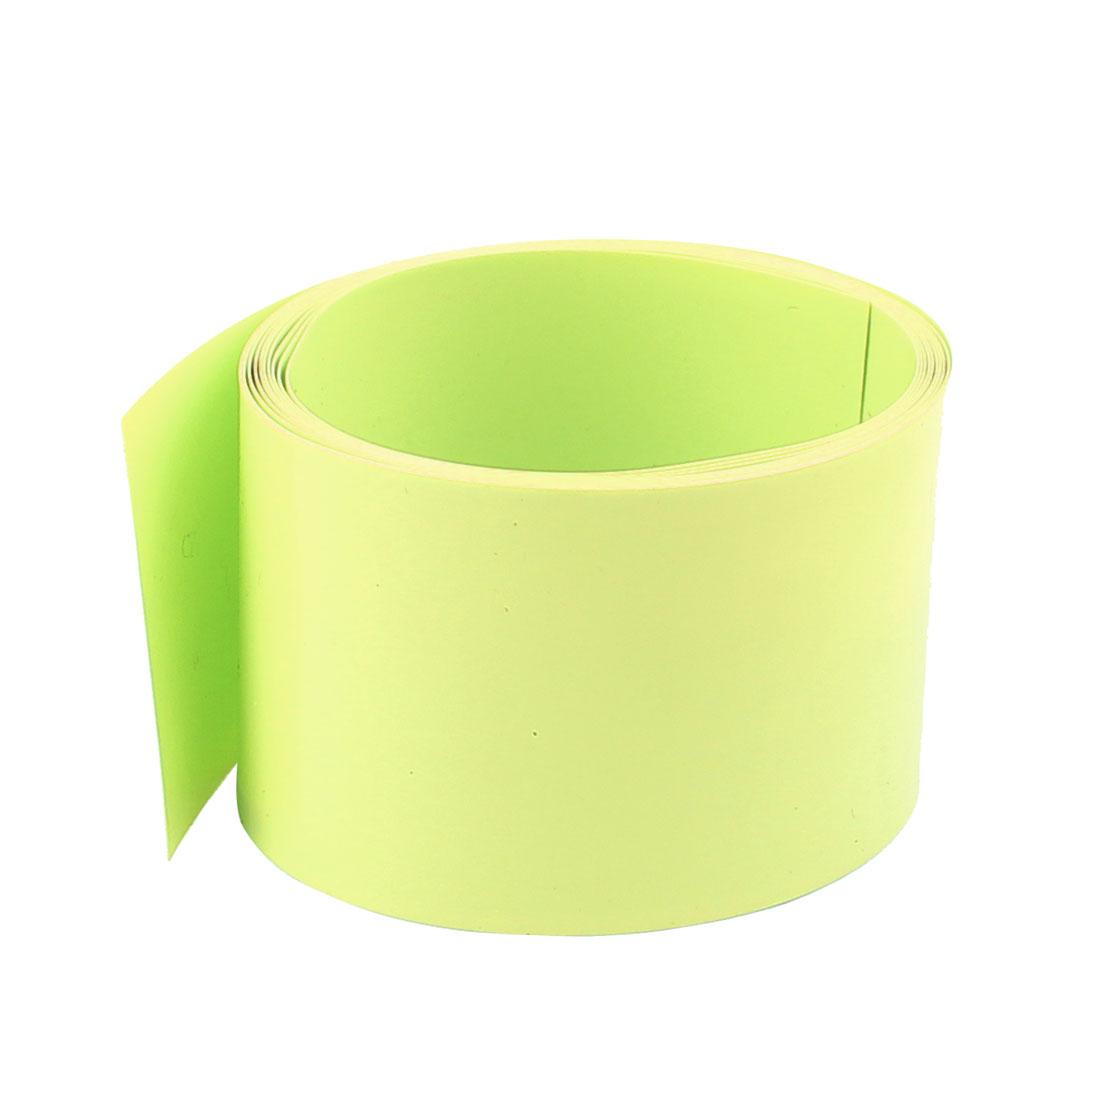 6.6ft 43mm Flat 27mm Dia PVC Heat Shrink Tubing Green for Battery Pack